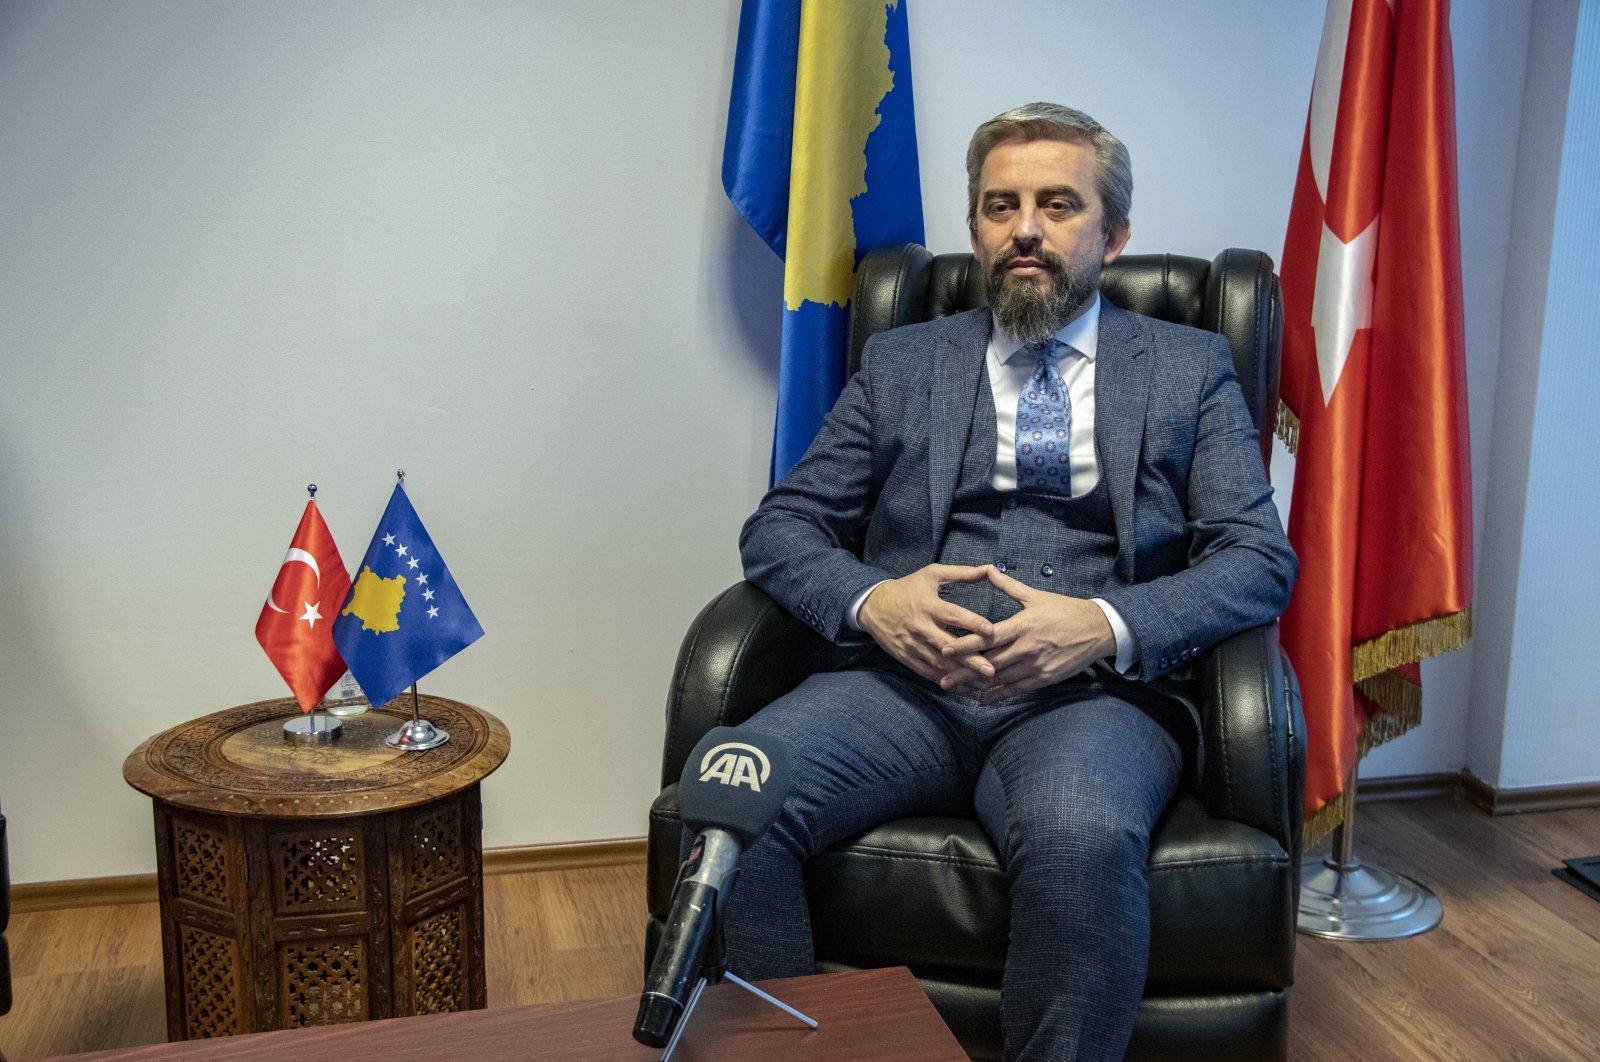 Kosovo to classify FETÖ, YPG as terrorist groups